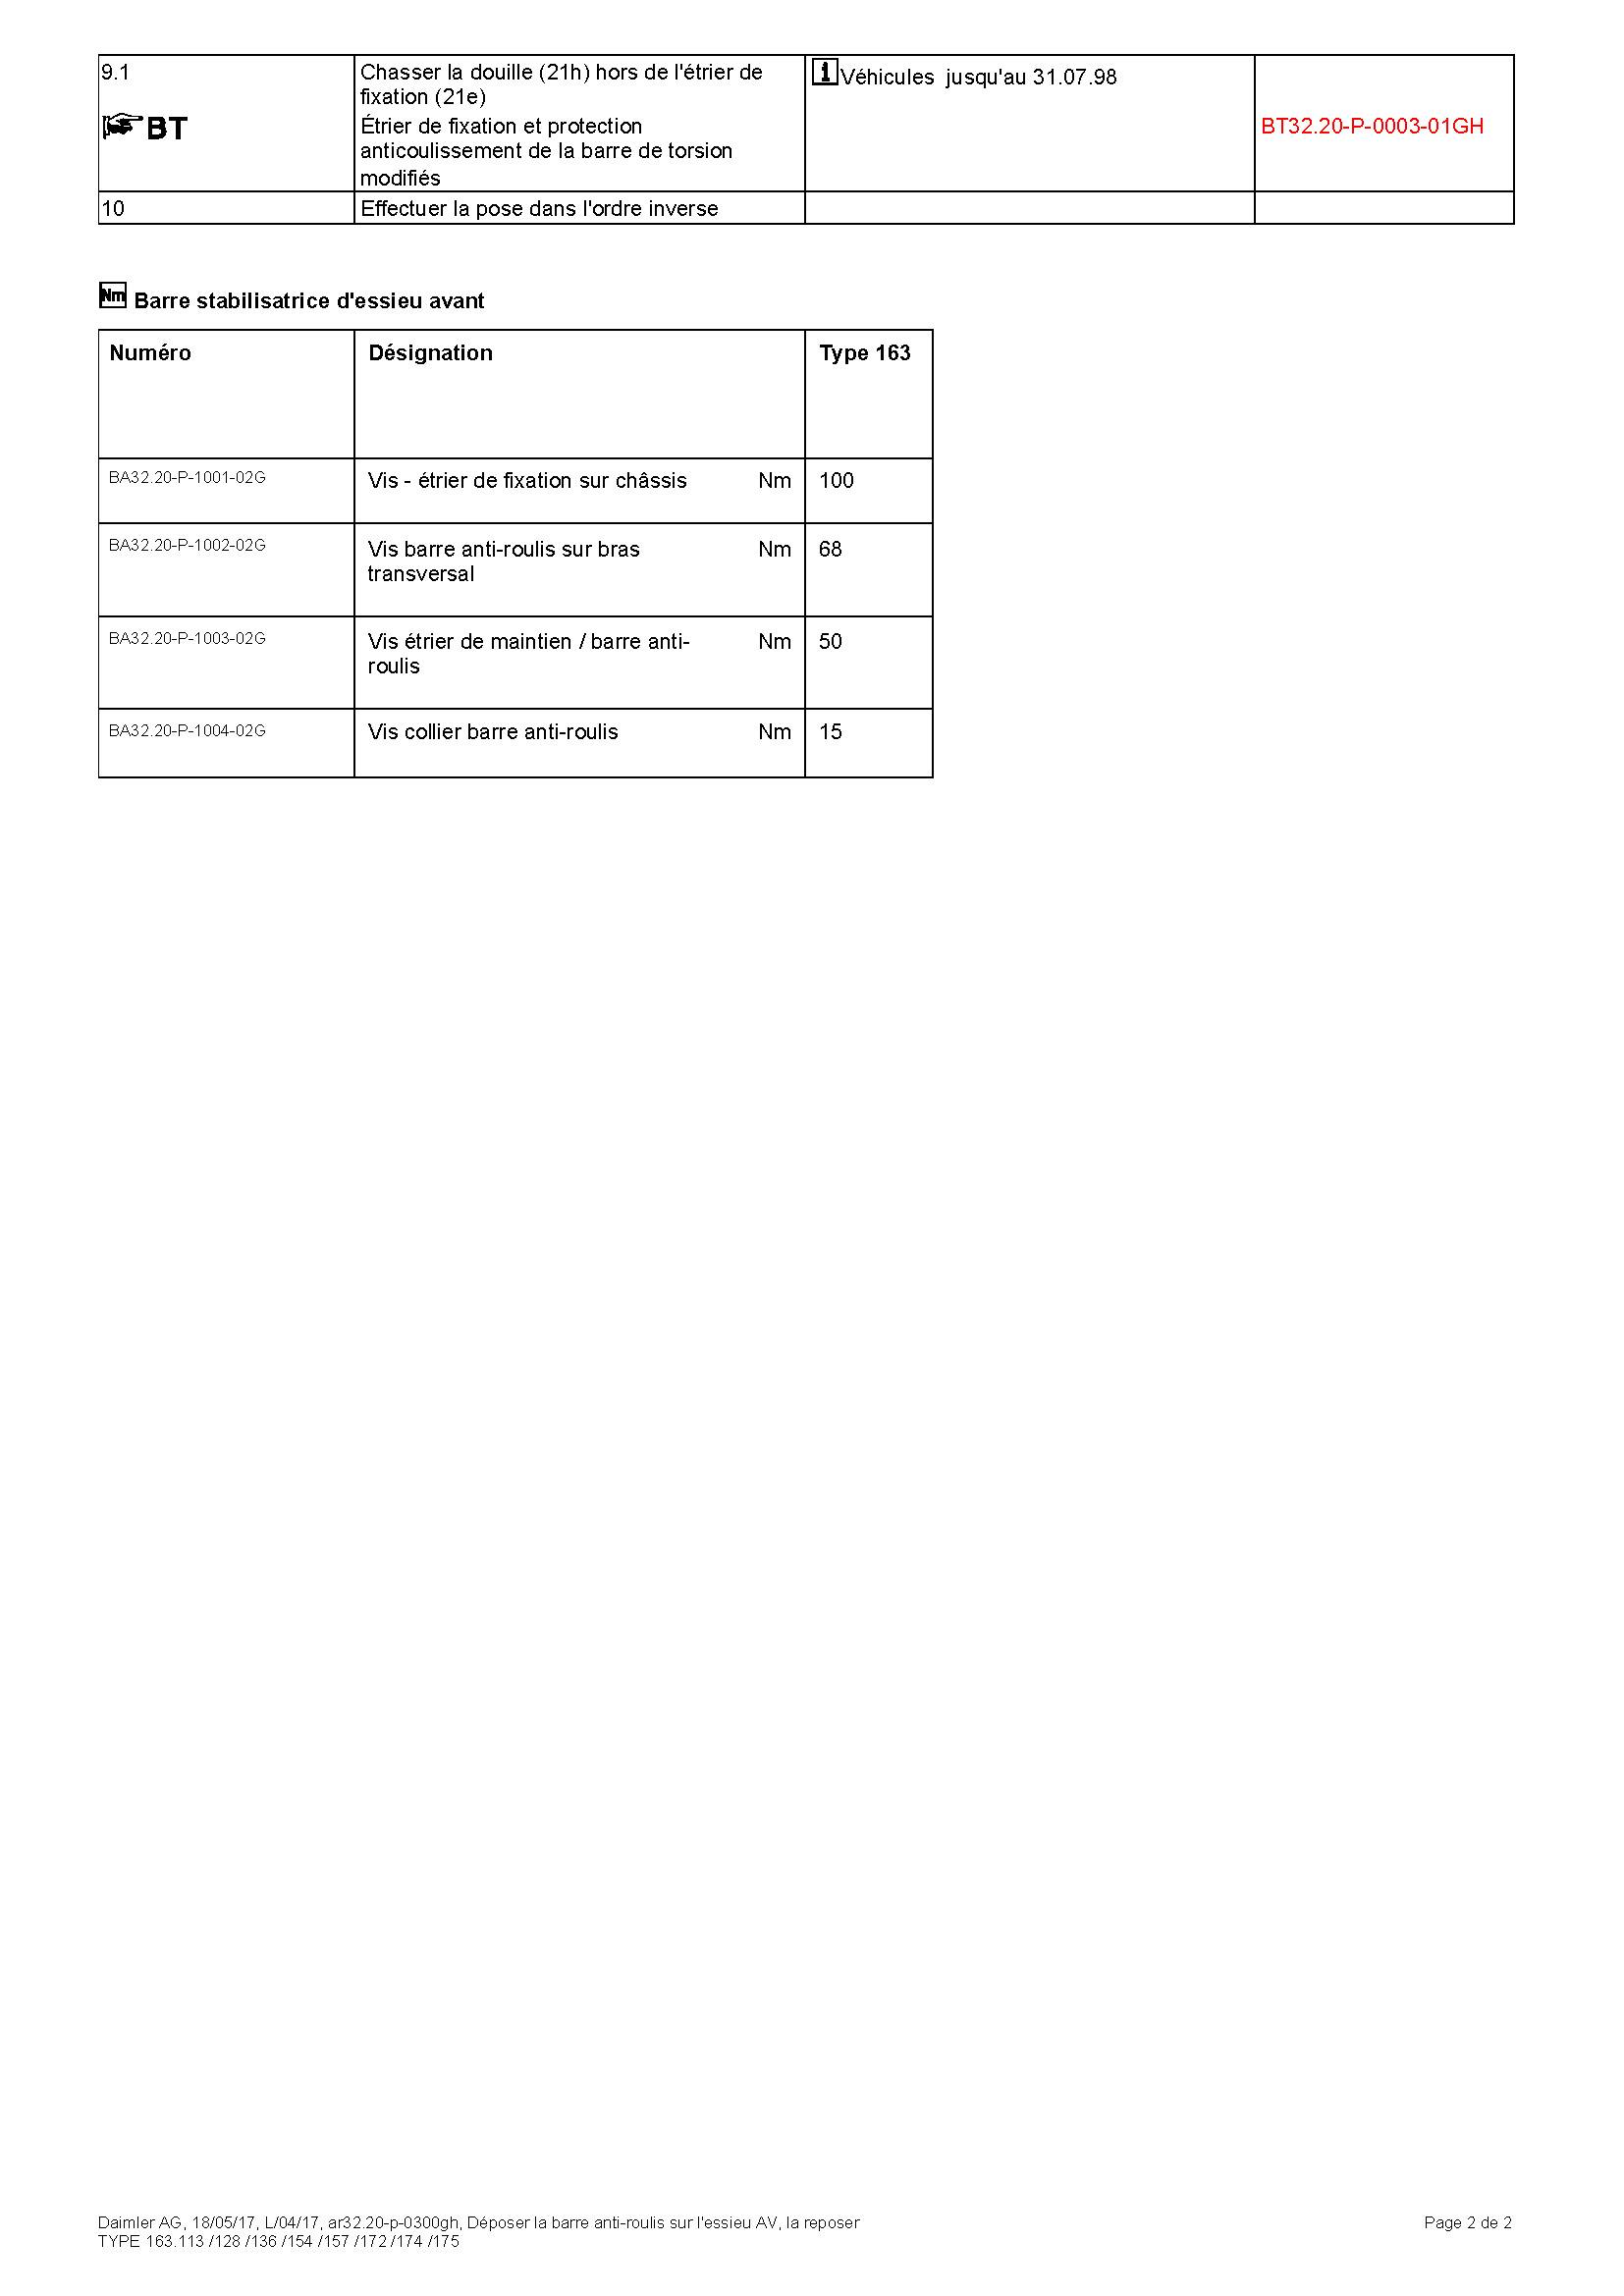 Deposer-la-barre-anti-roulis-sur-l-essieu-AV-la-reposer_Page_2.jpg